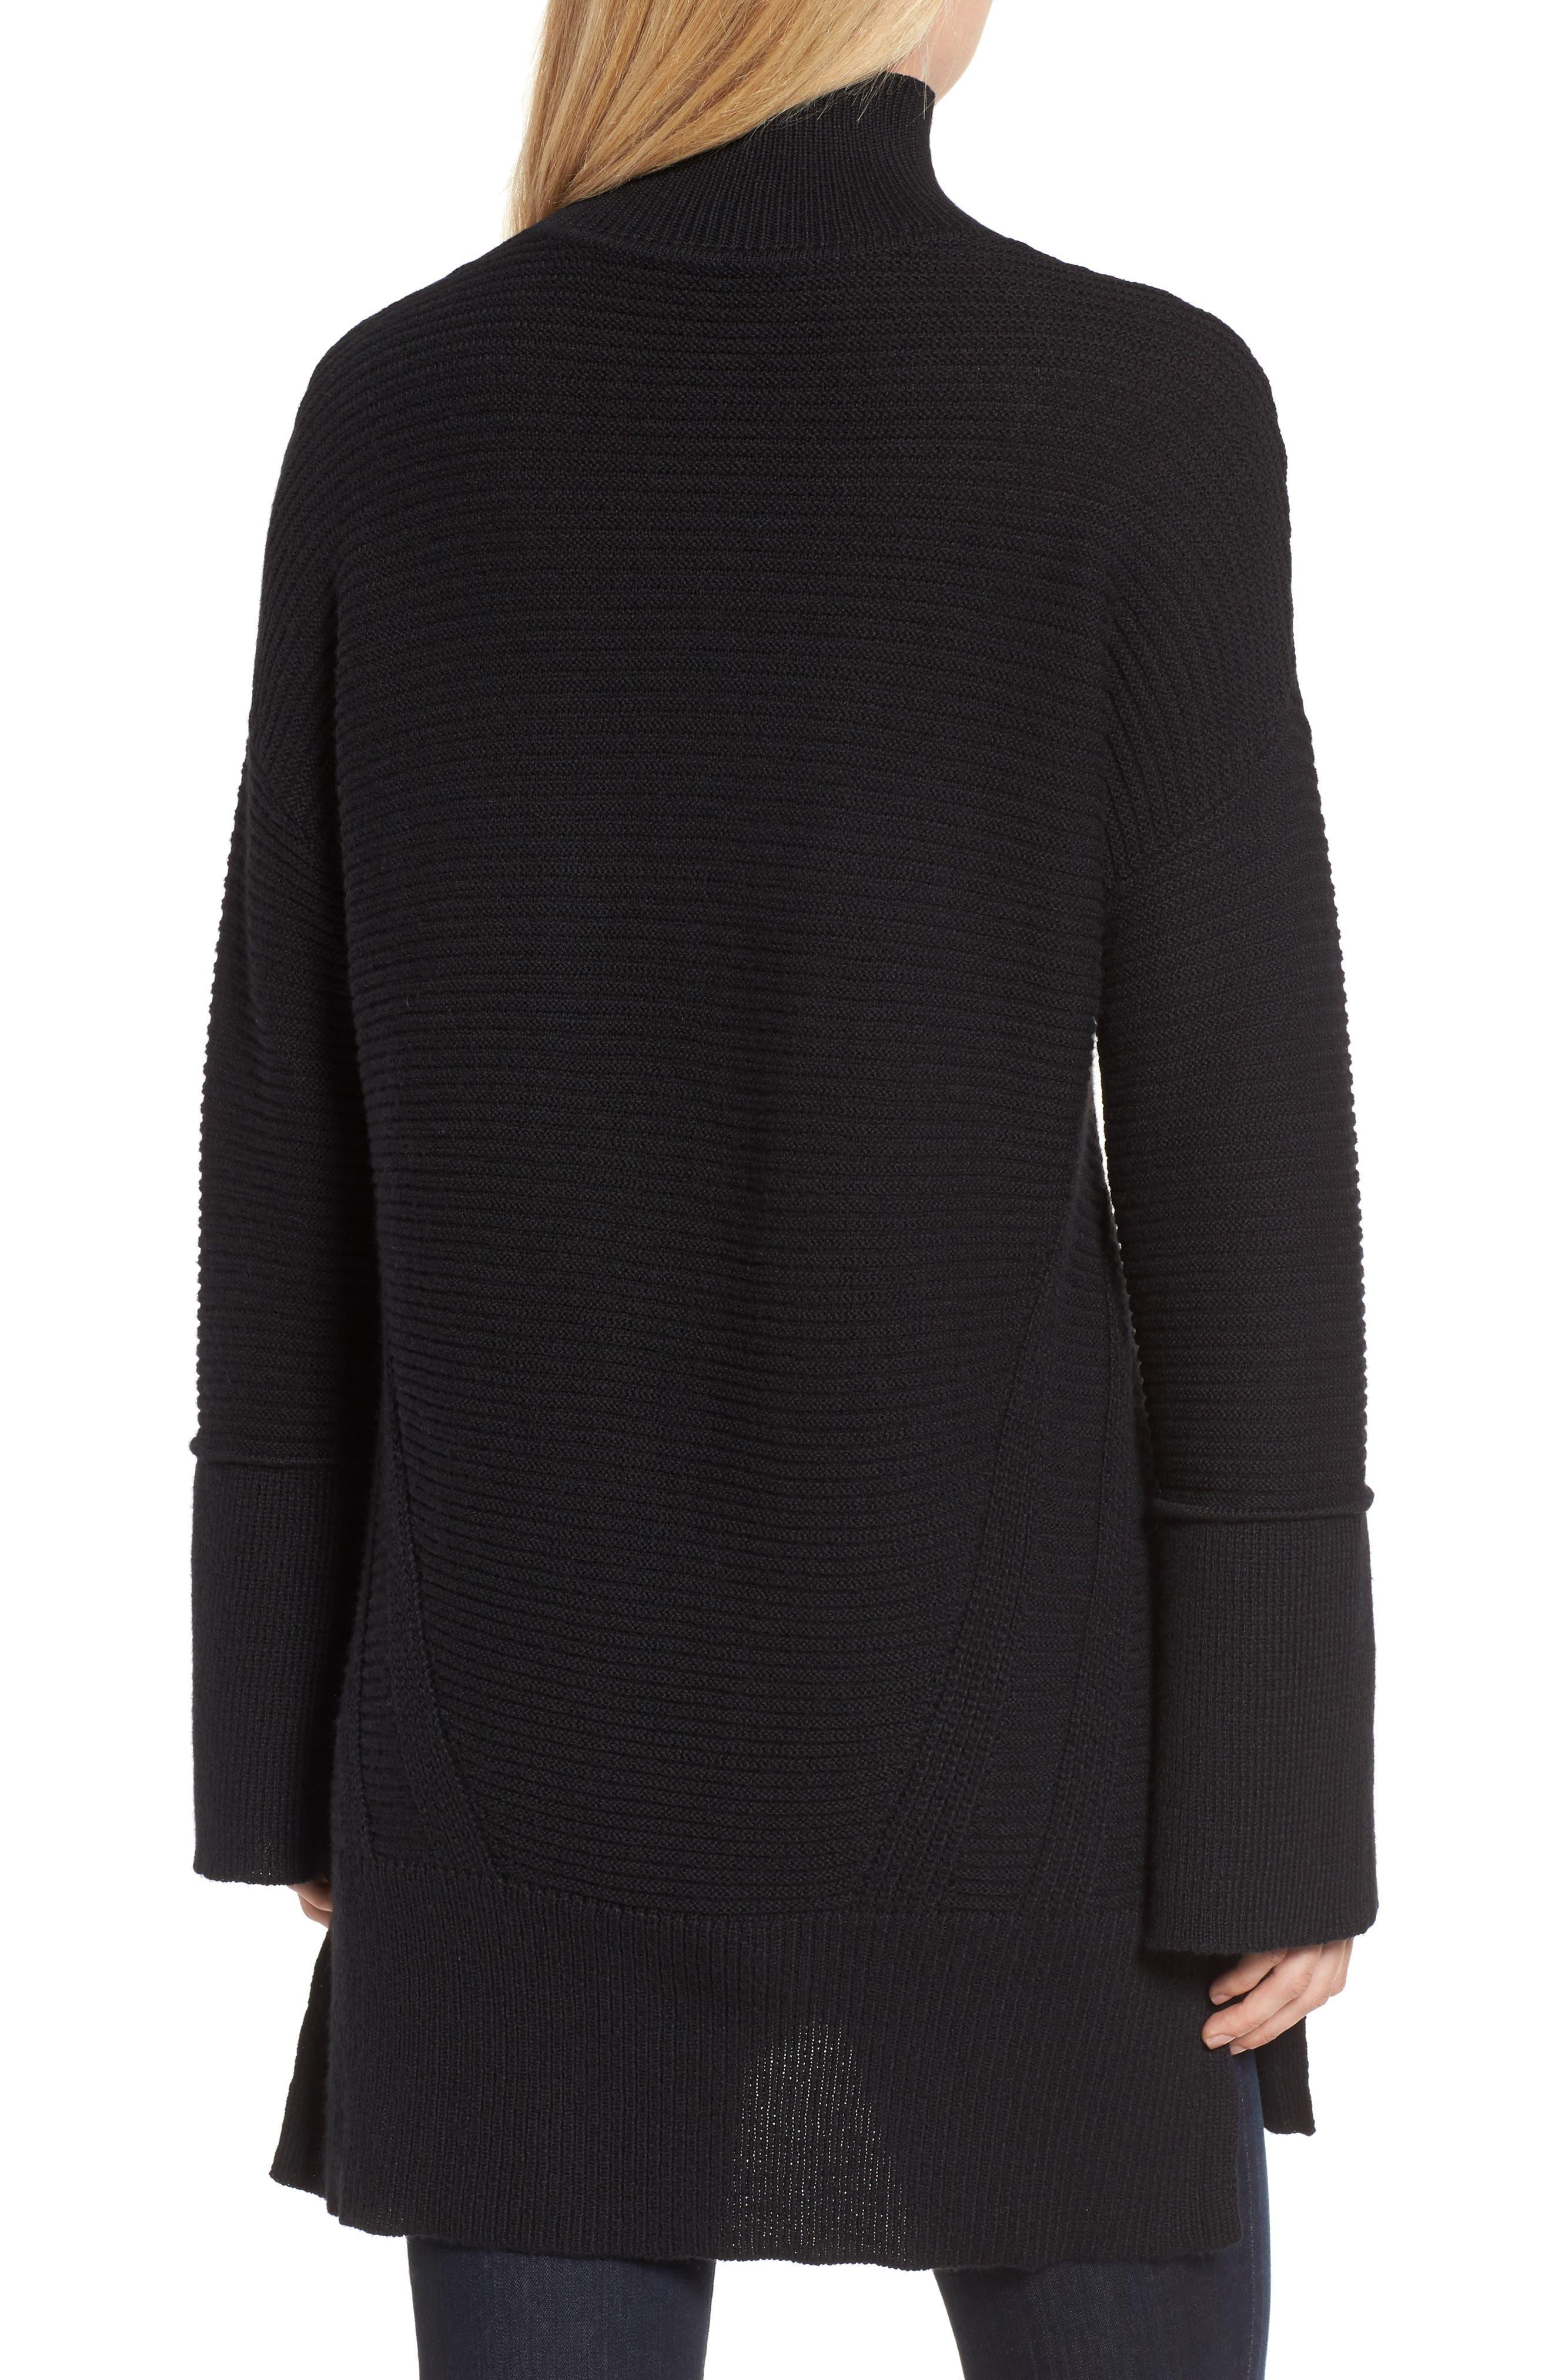 Ribbed Turtleneck Tunic Sweater,                             Alternate thumbnail 2, color,                             BLACK